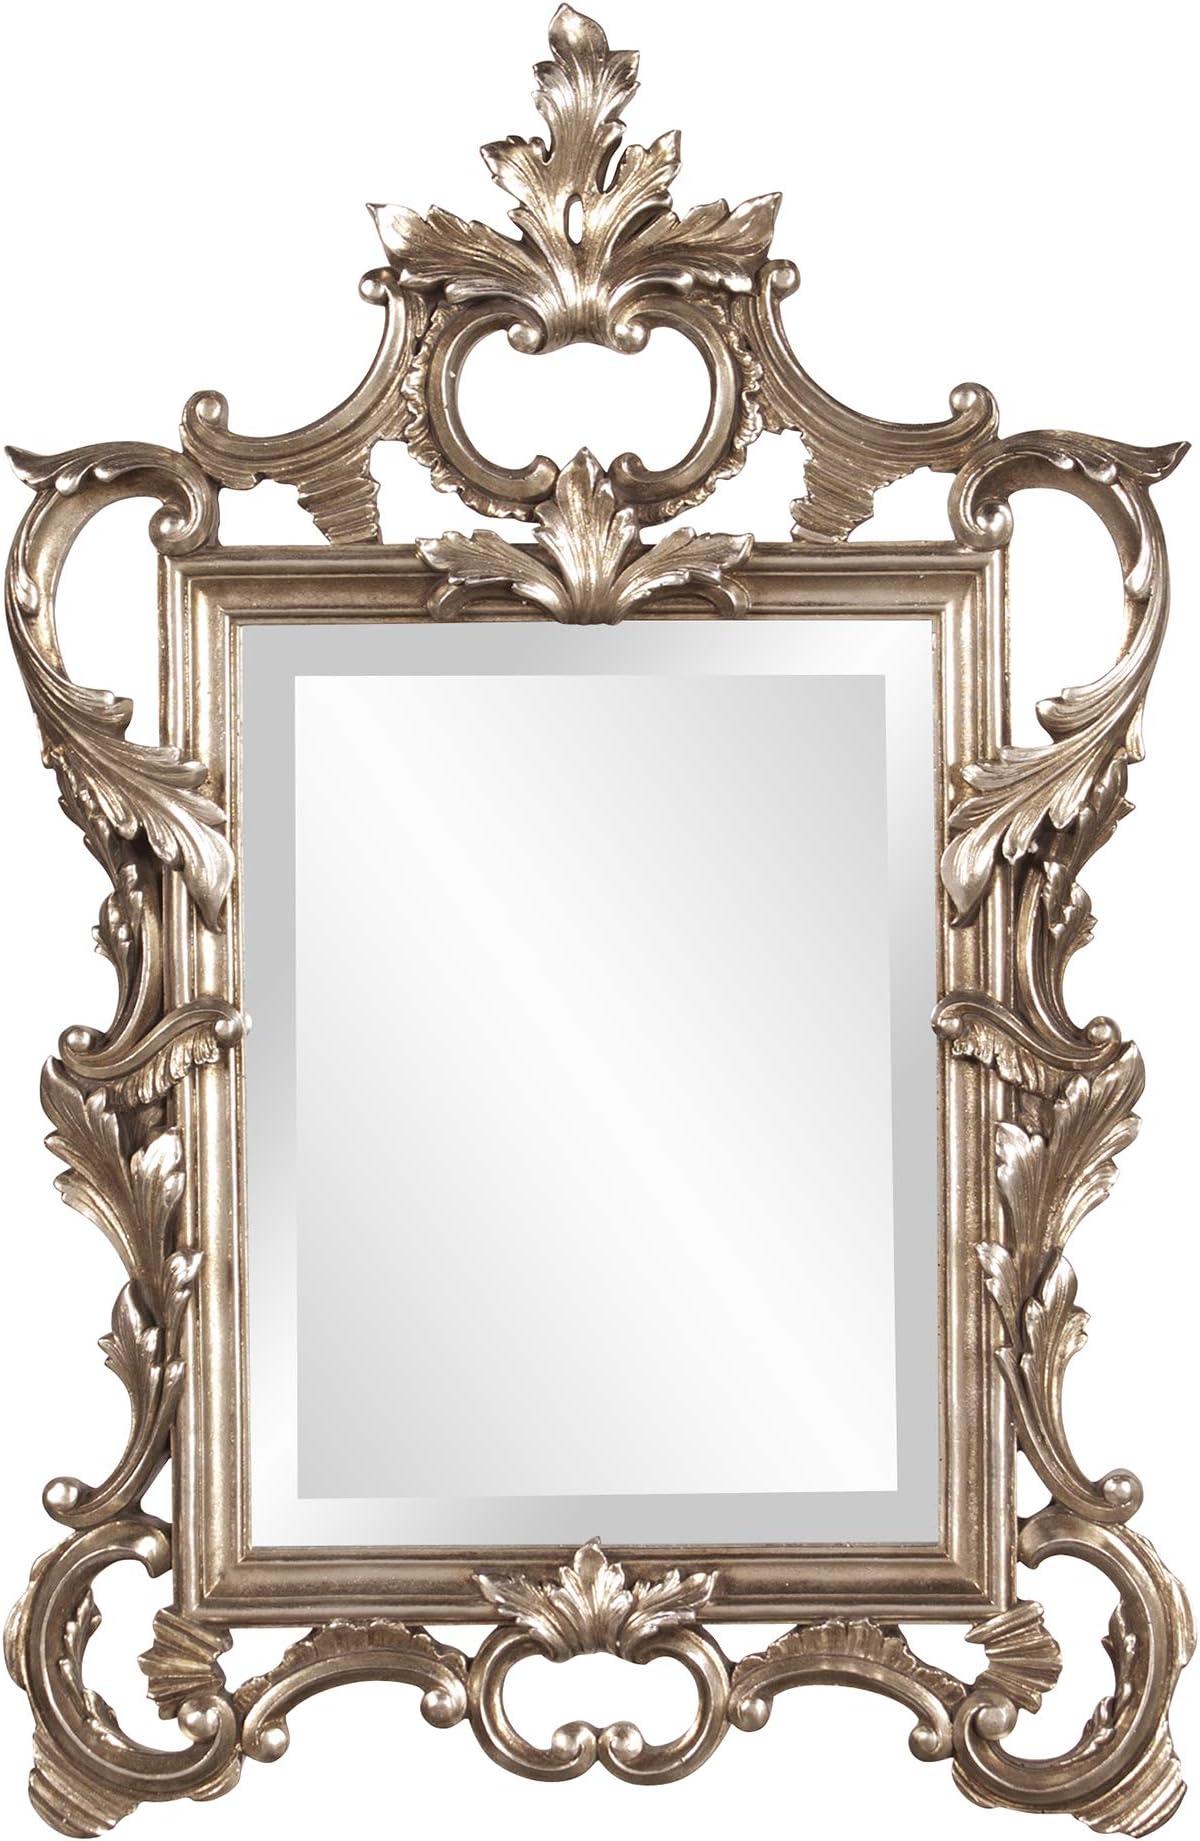 Howard Elliott 84012 Andrews Scroll Mirror, Champagne with Silver Leaf